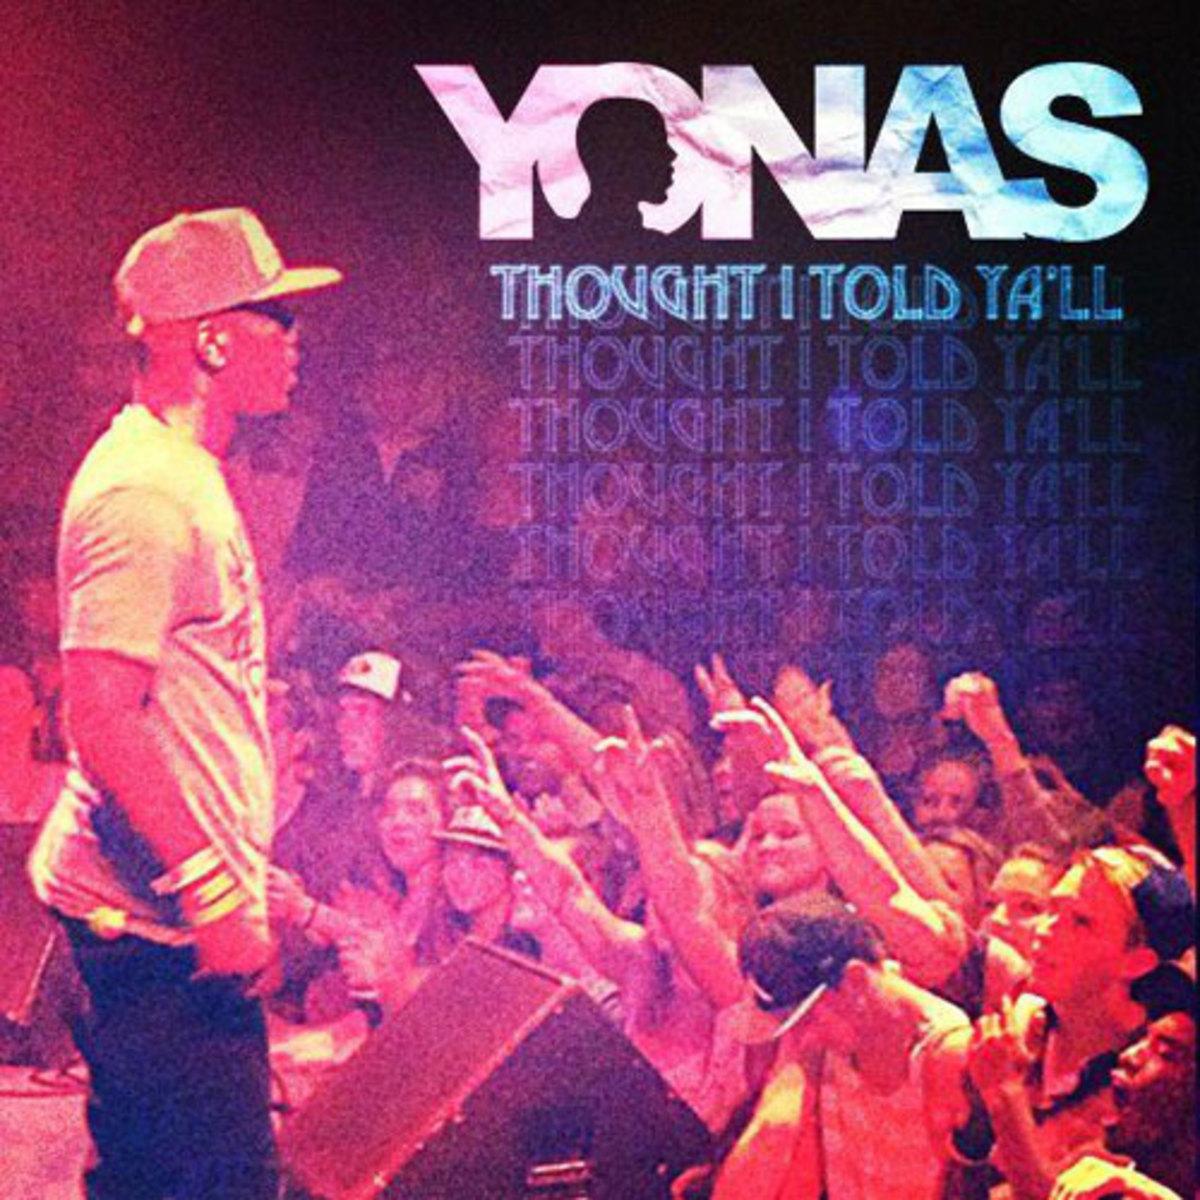 yonas-thoughtitoldyall.jpg